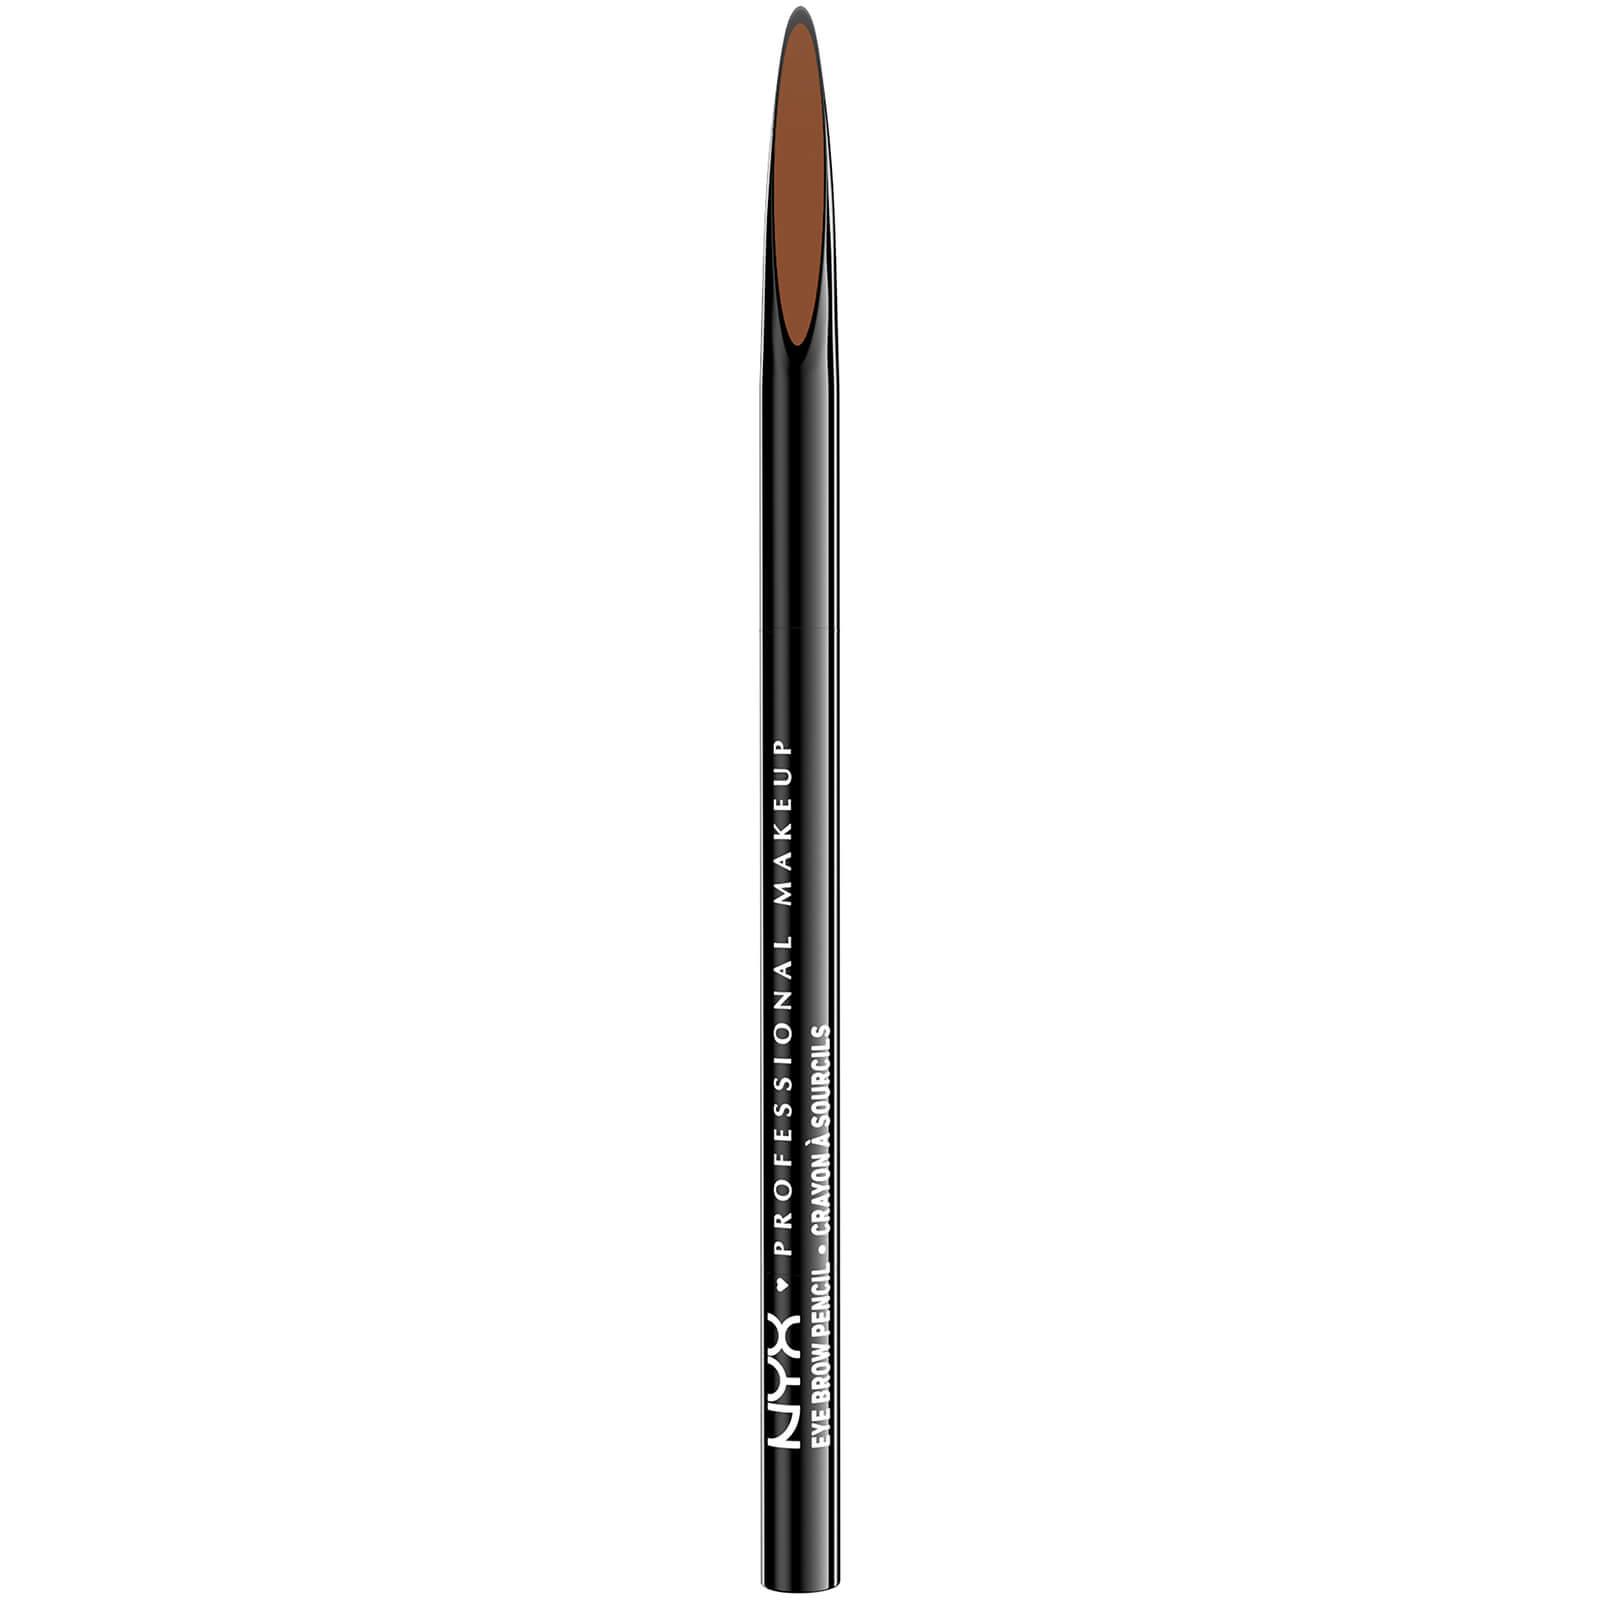 nyx professional makeup precision brow pencil (various shades) - espresso